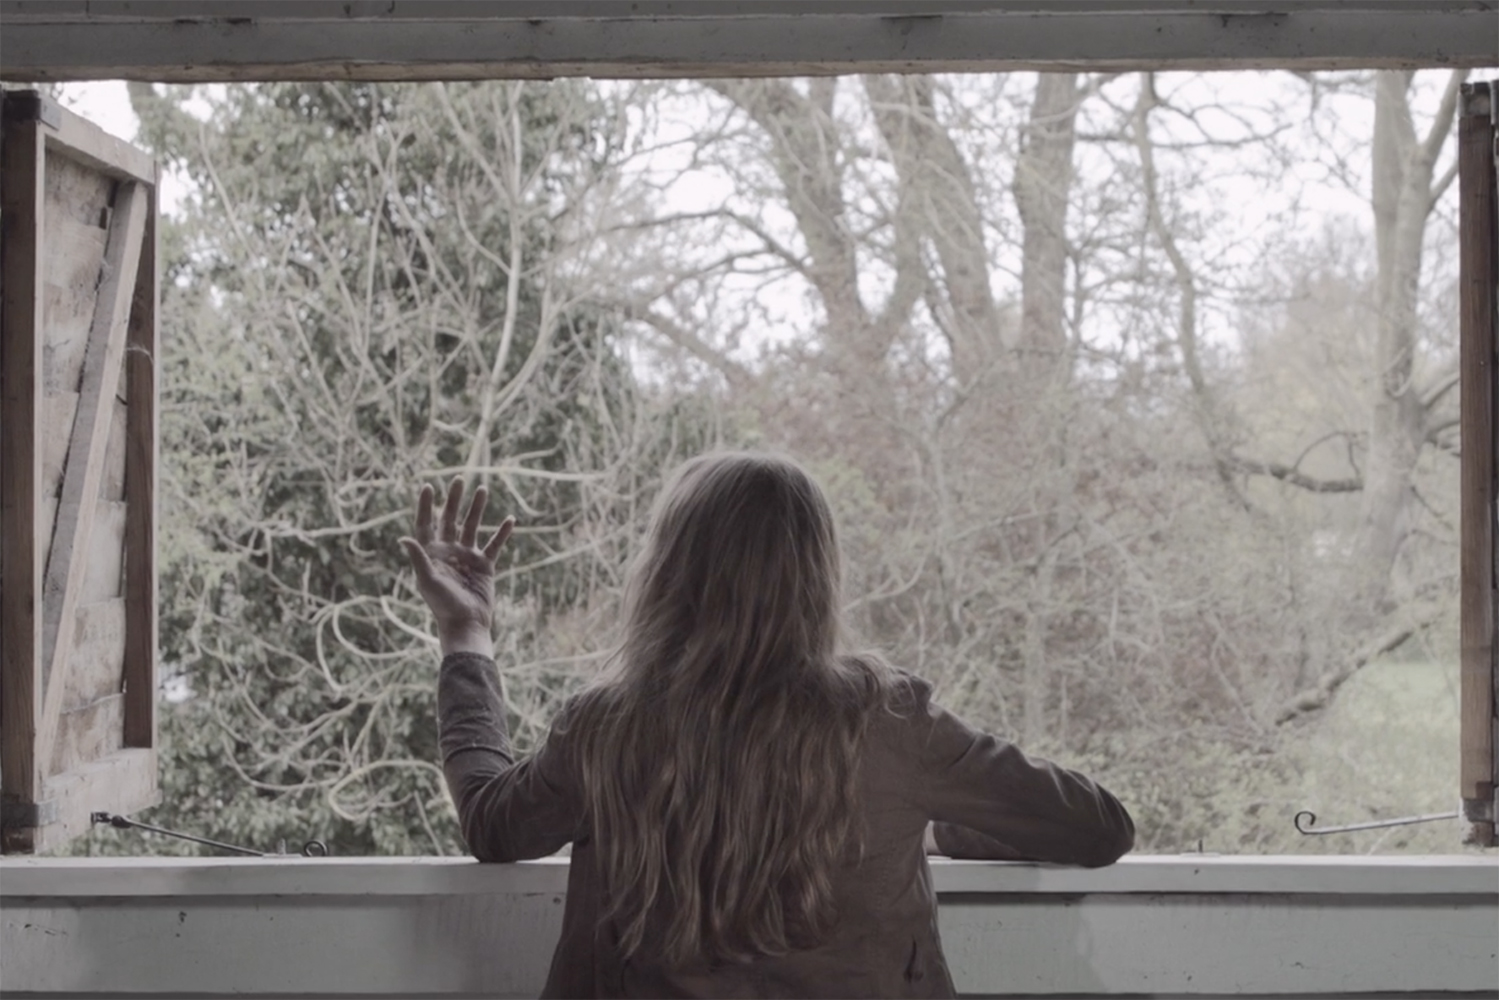 phoebe_nightingale_stay_the_burning_short_film_experimental_emma_in_window.jpg